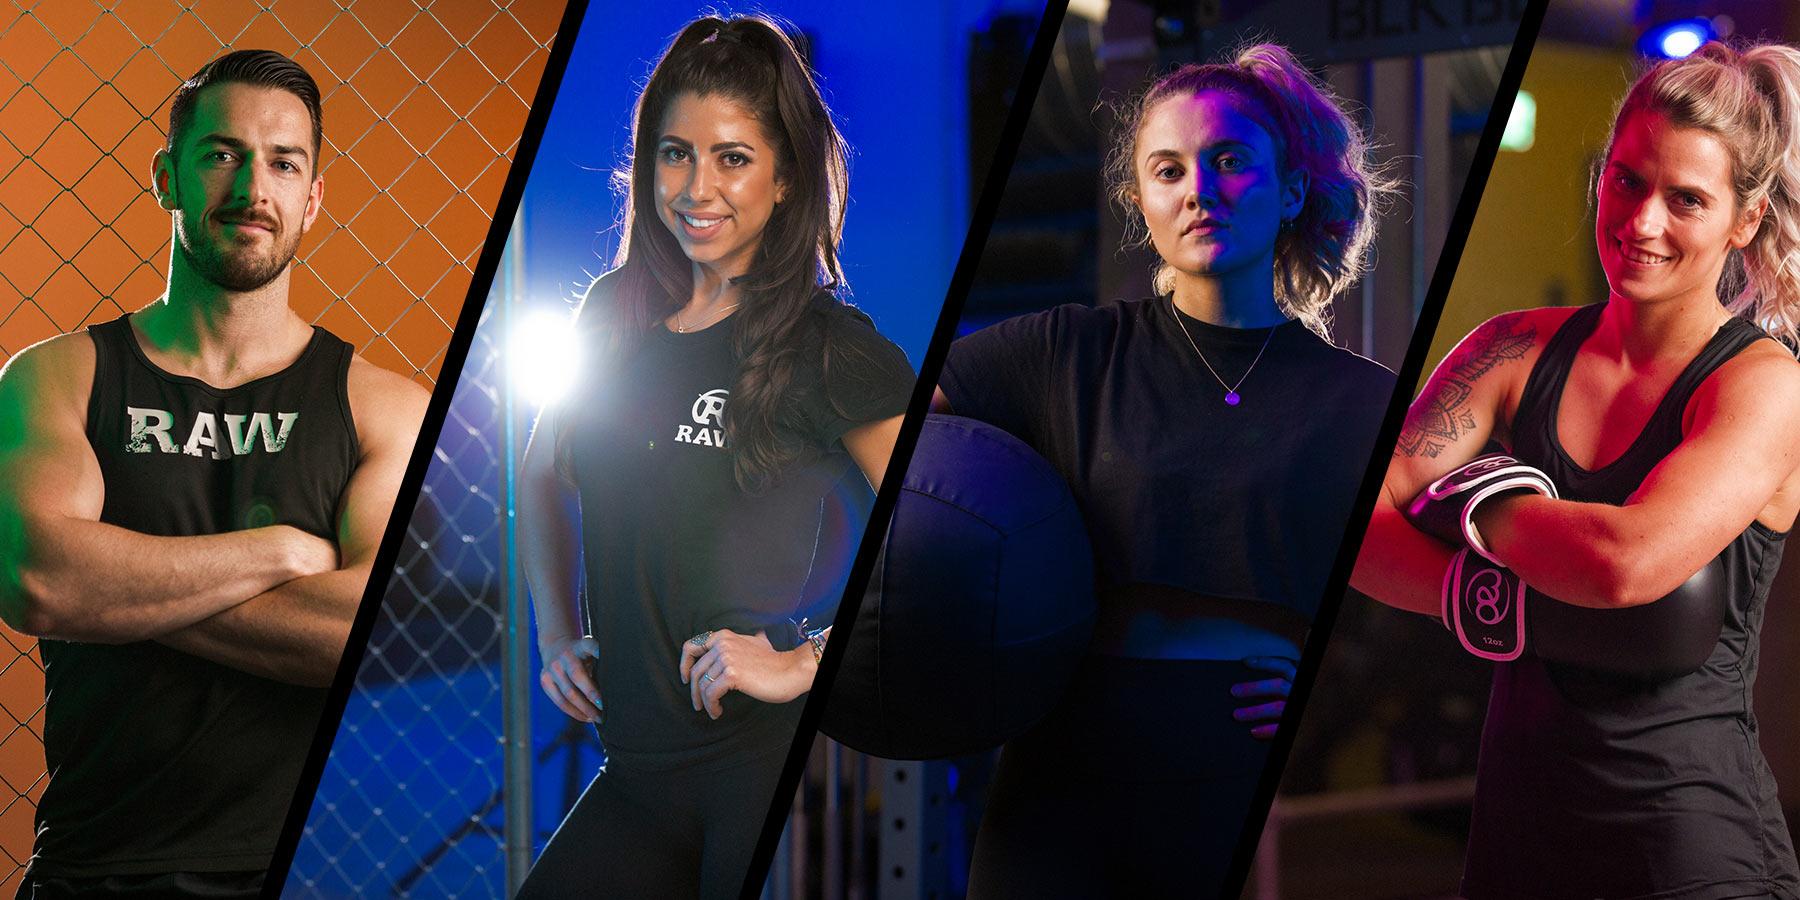 4 personal trainers superheroes